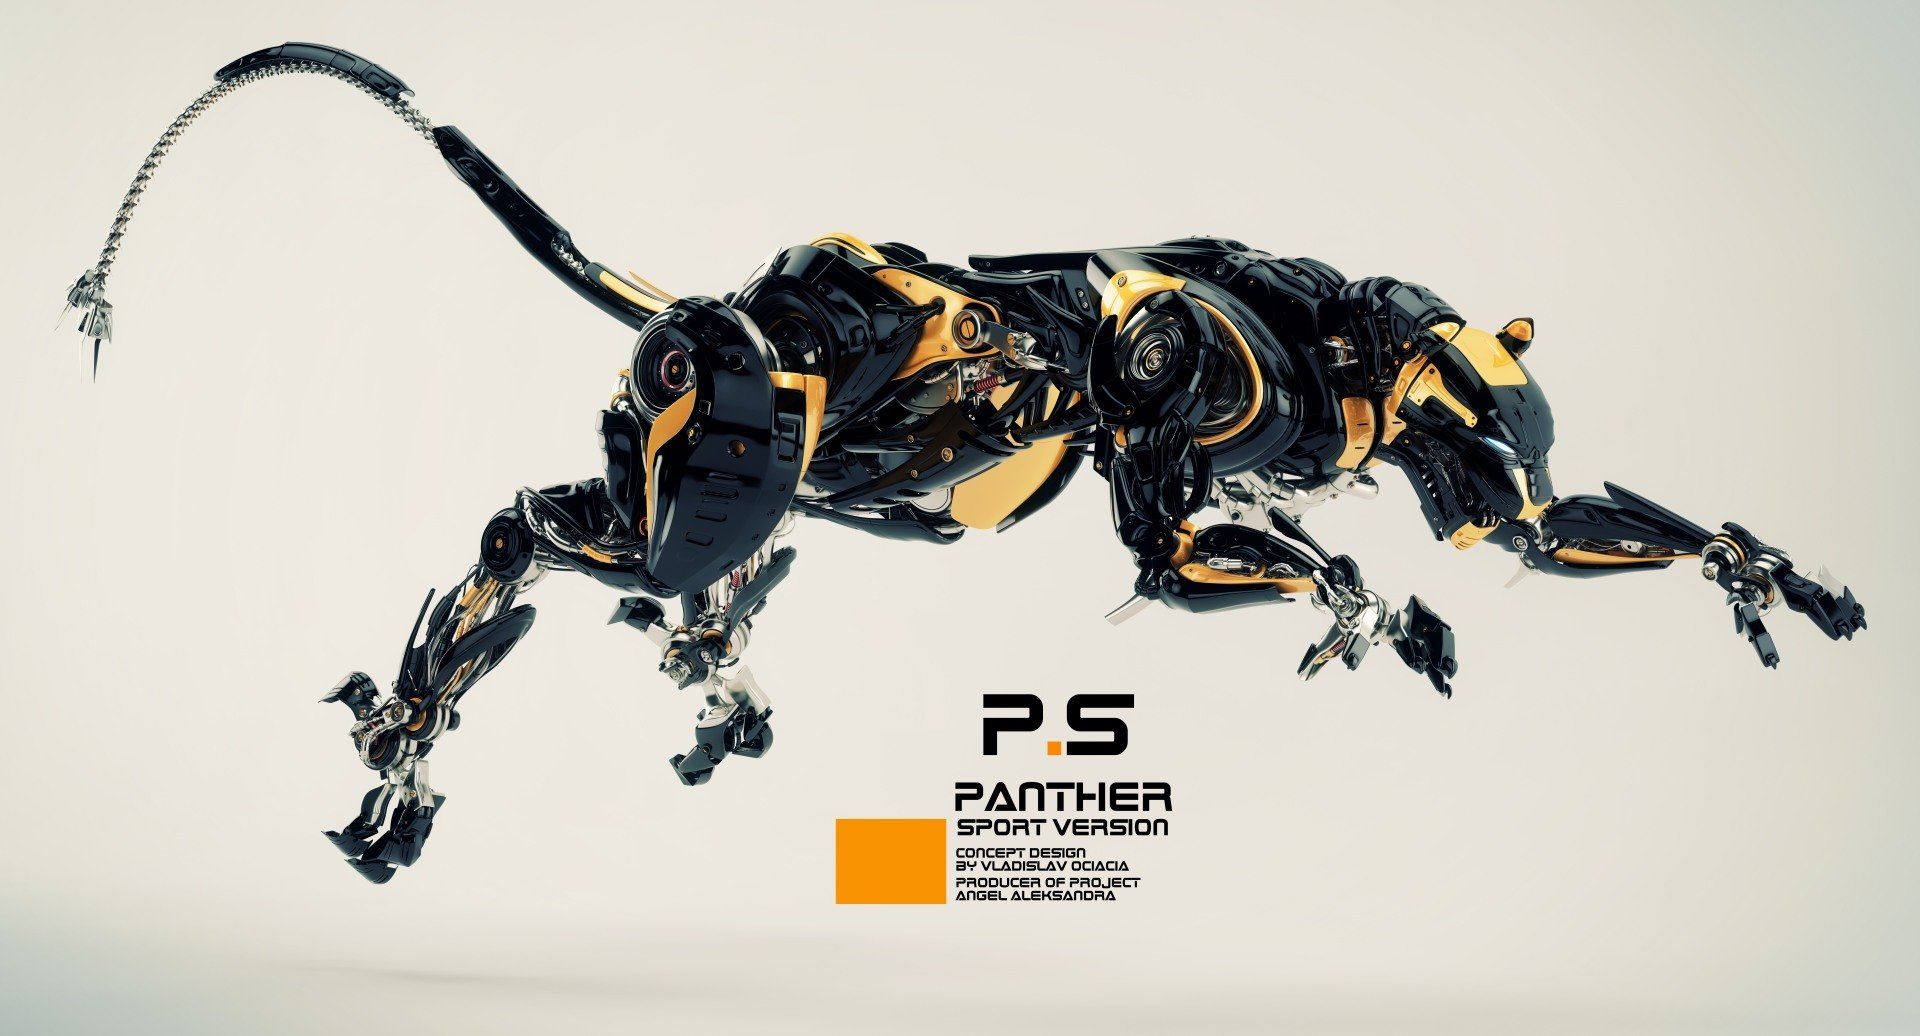 Vladislav ociacia robotic panther 12